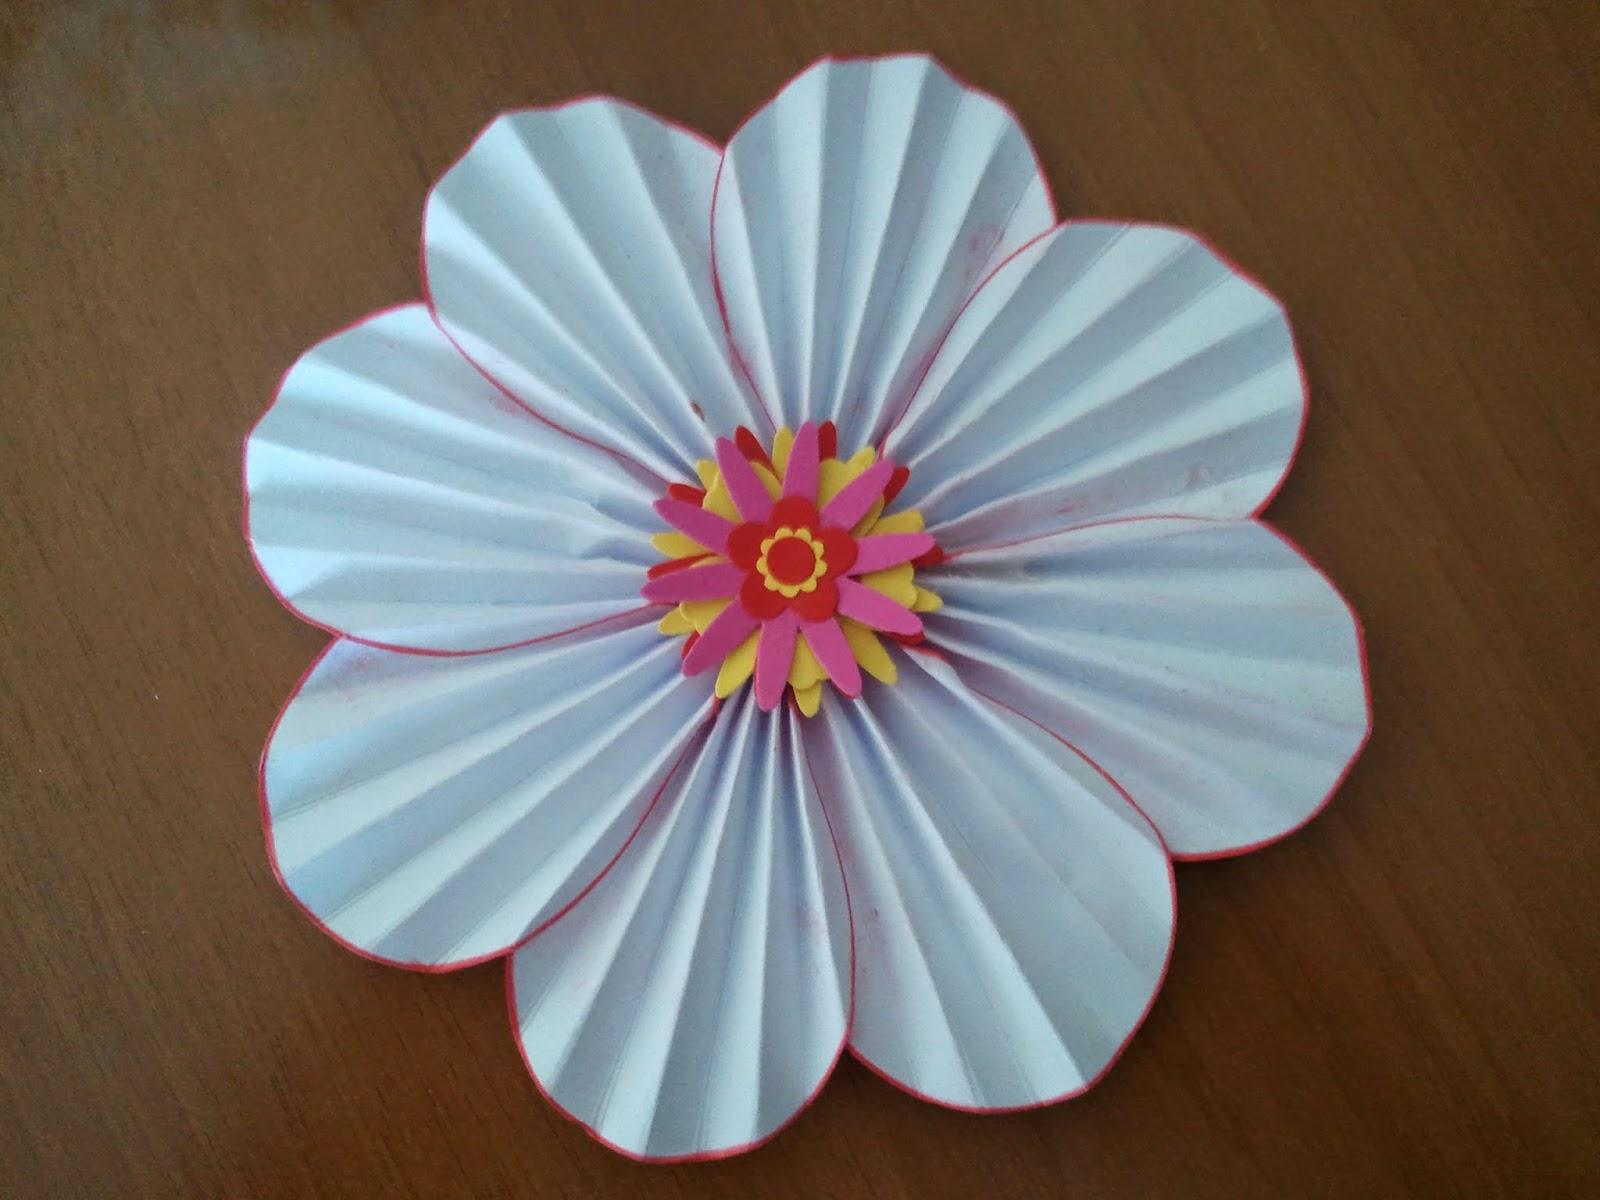 Ilcassettodigio fiori di carta scrapbooking tutorial for Fiori semplici